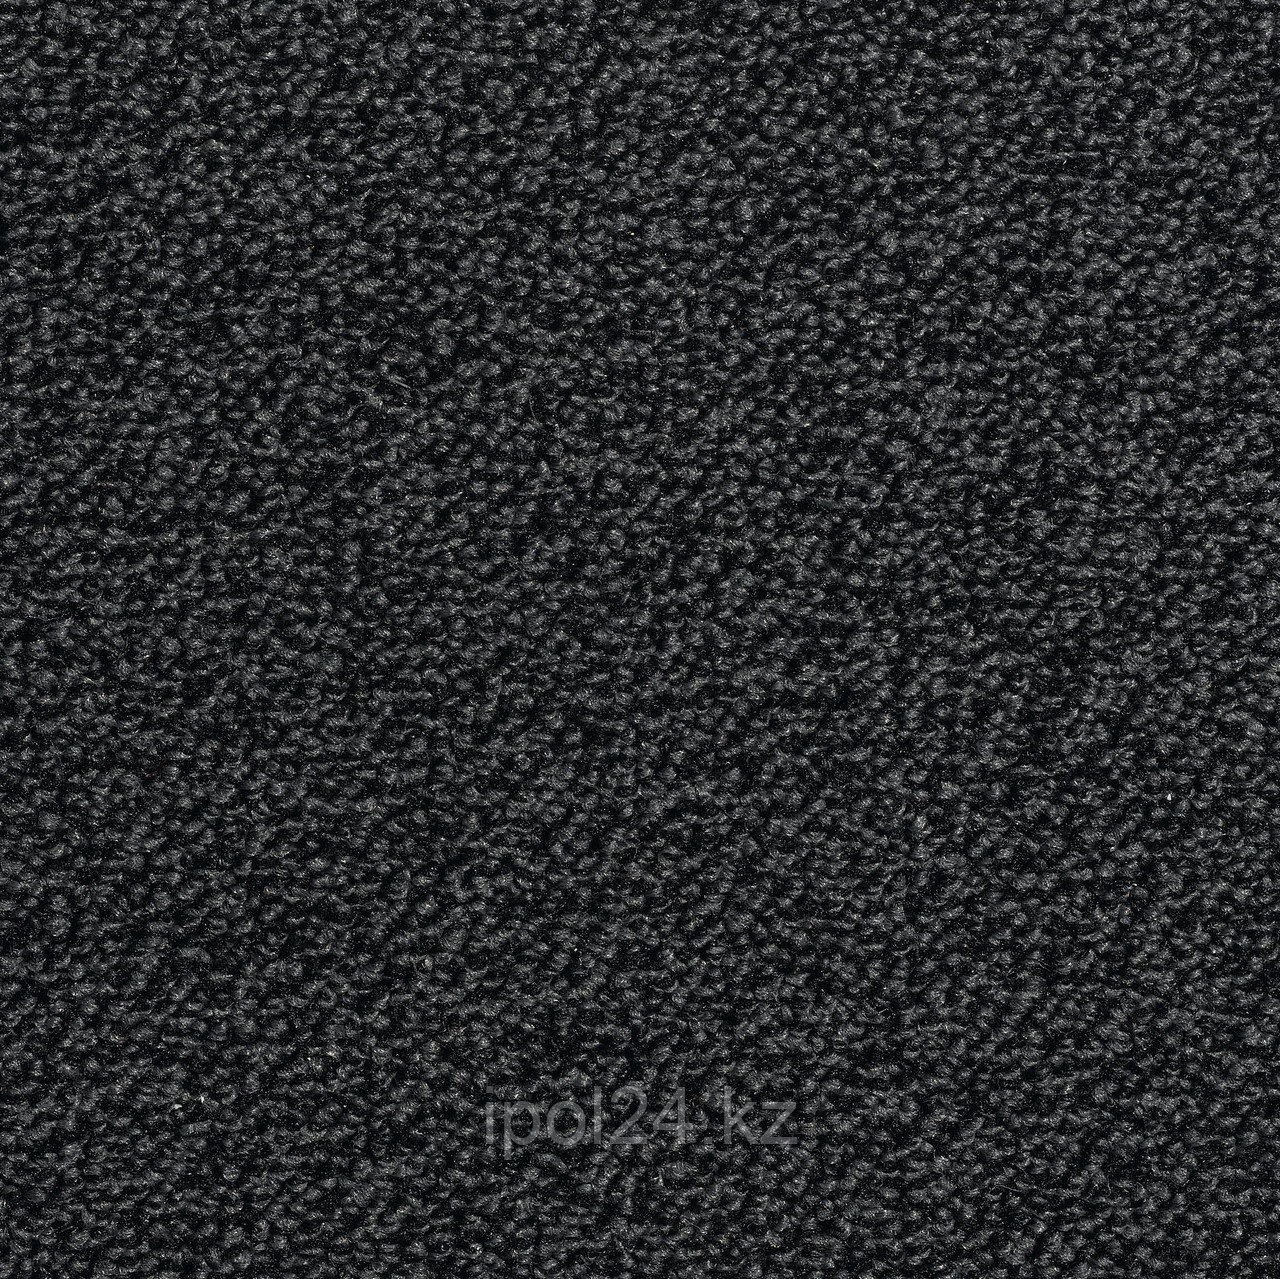 Ковровая плитка Lava 2